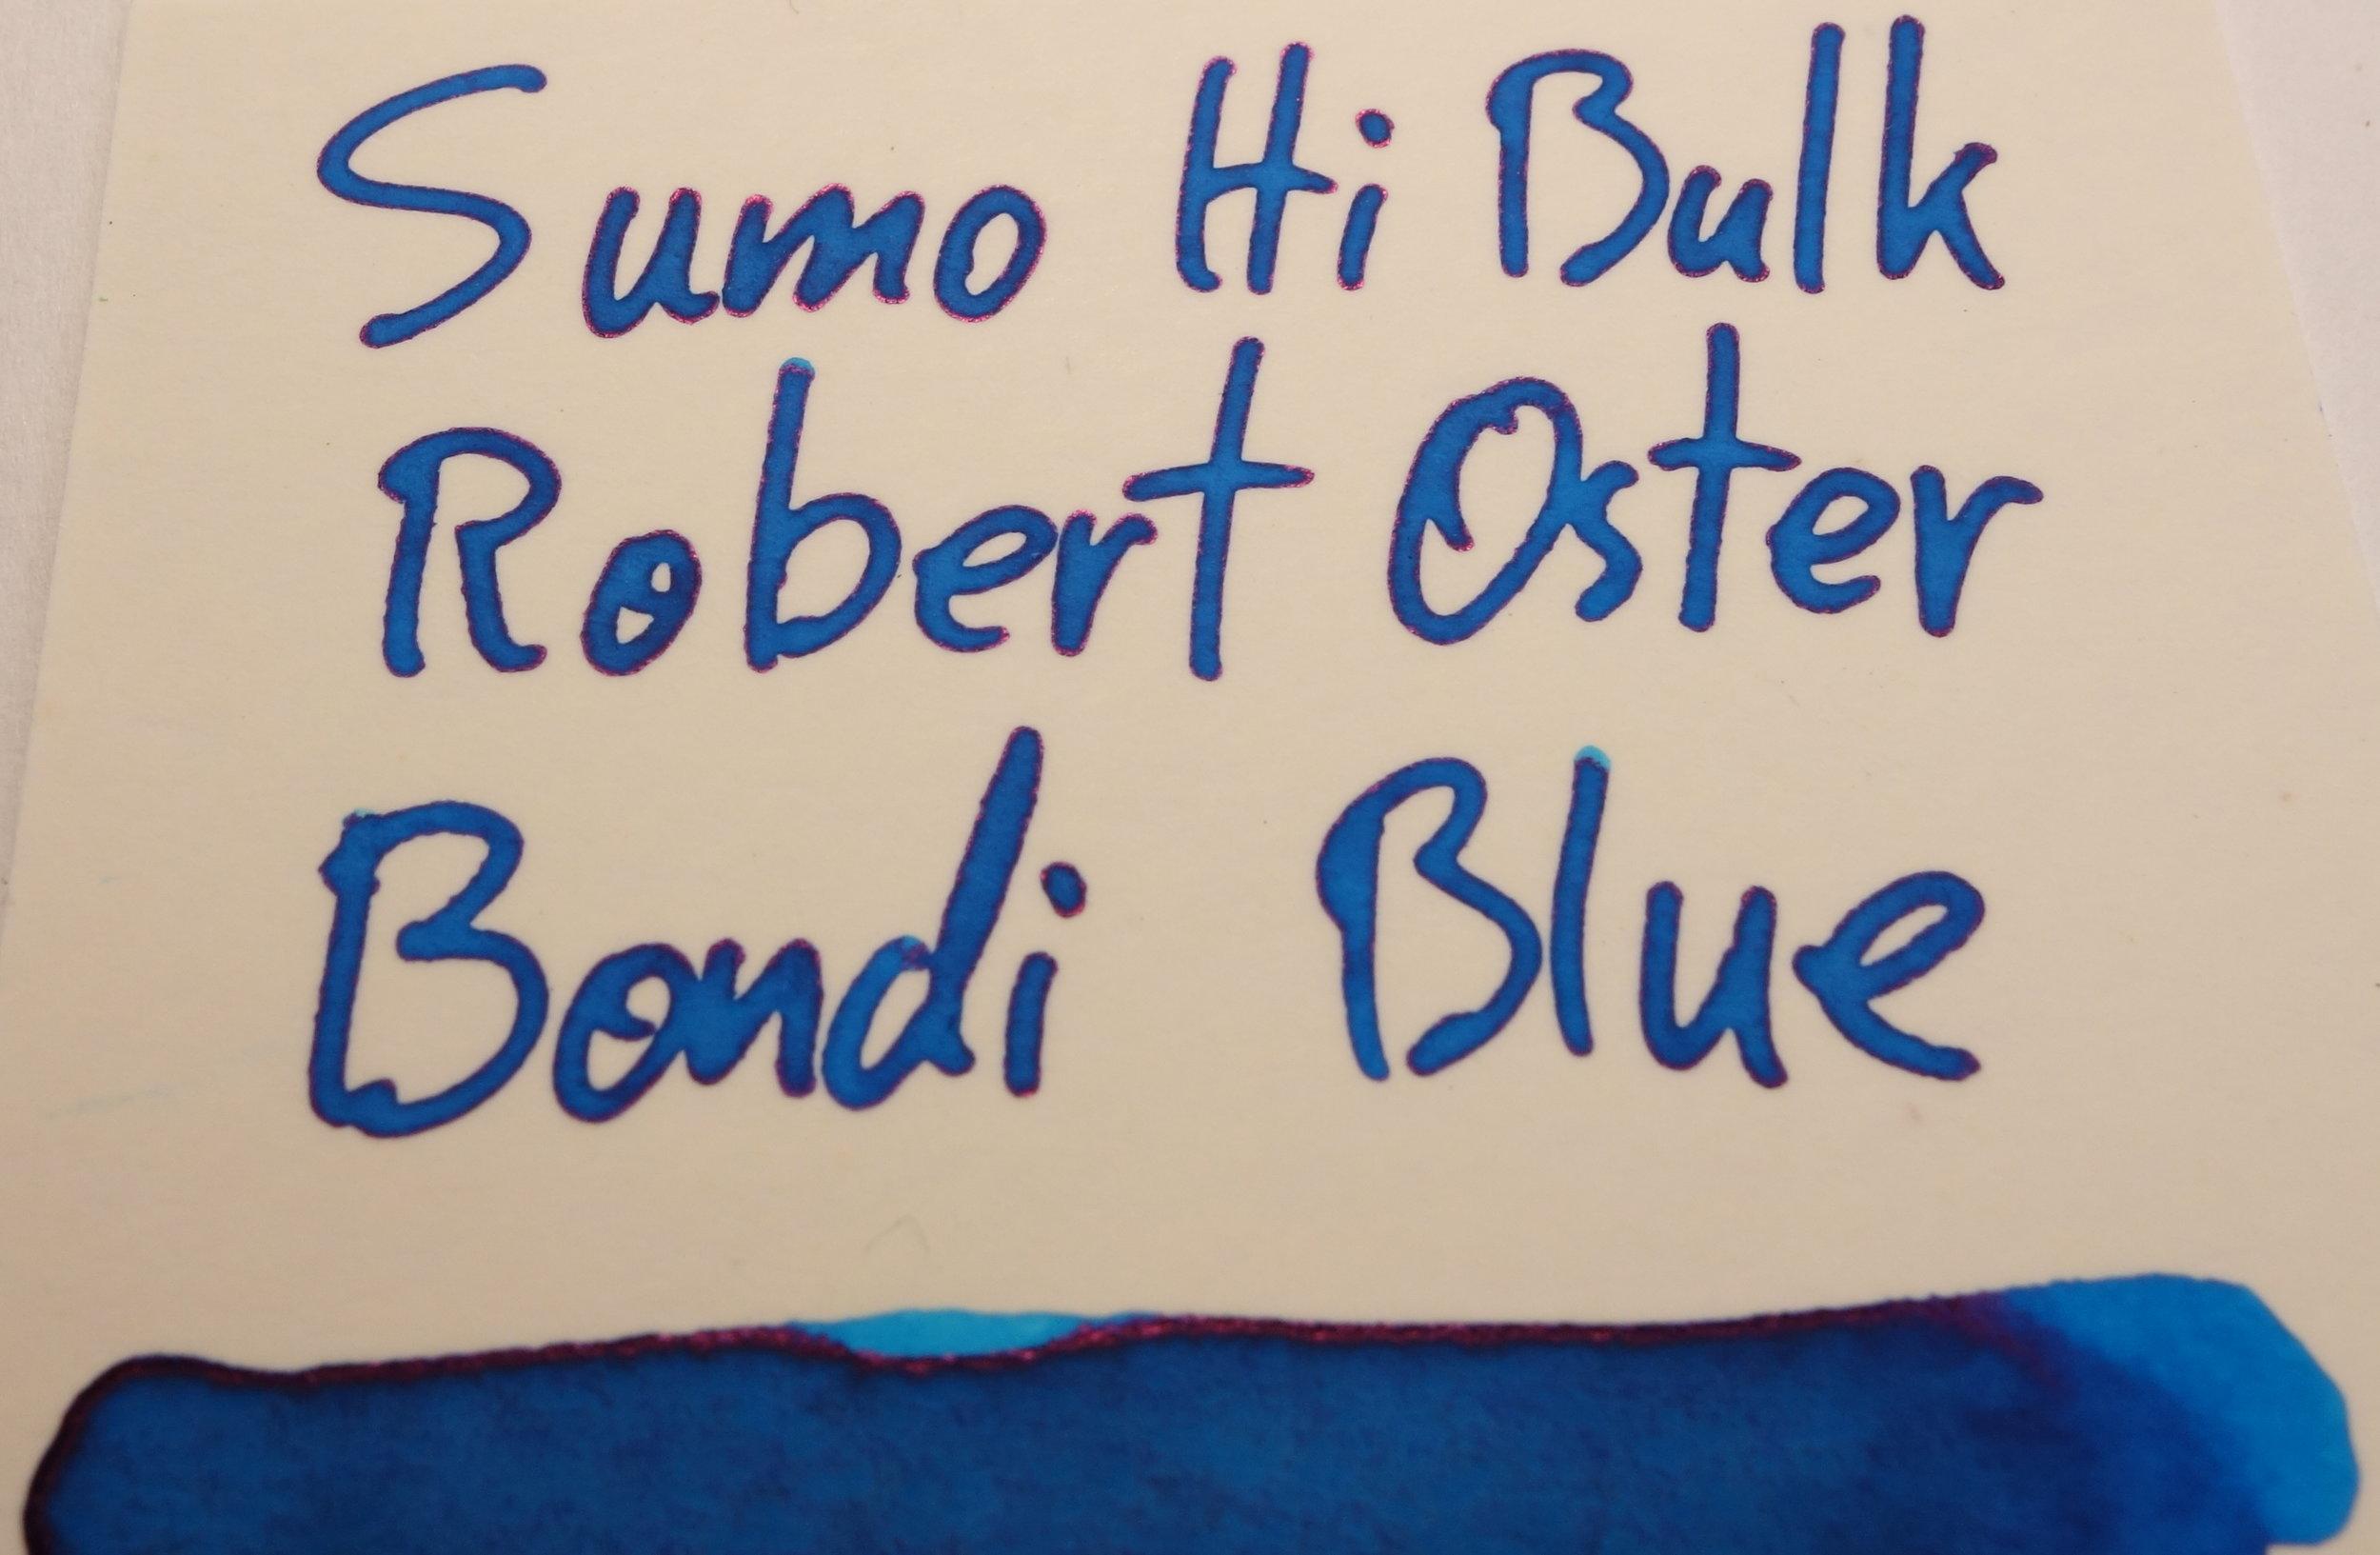 Robert Oster Bondi Blue Sheen Sumo Hi Bulk.JPG